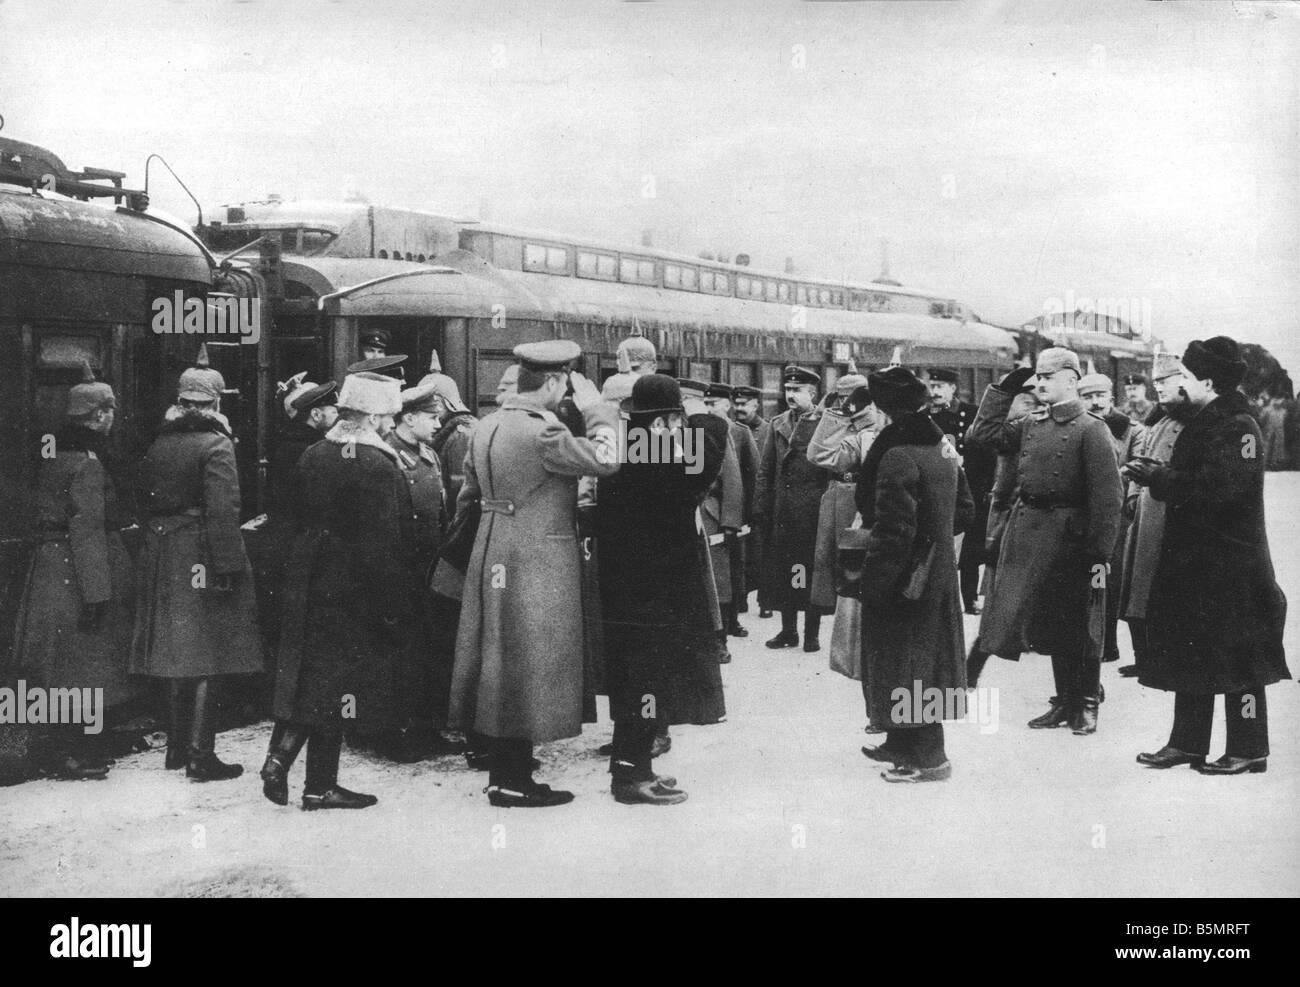 9 1917 12 15 A1 16 de Brest Litowsk llegada de Russ delegacy Guerra Mundial 1 1914 18 ruso armisticio alemán de Foto de stock